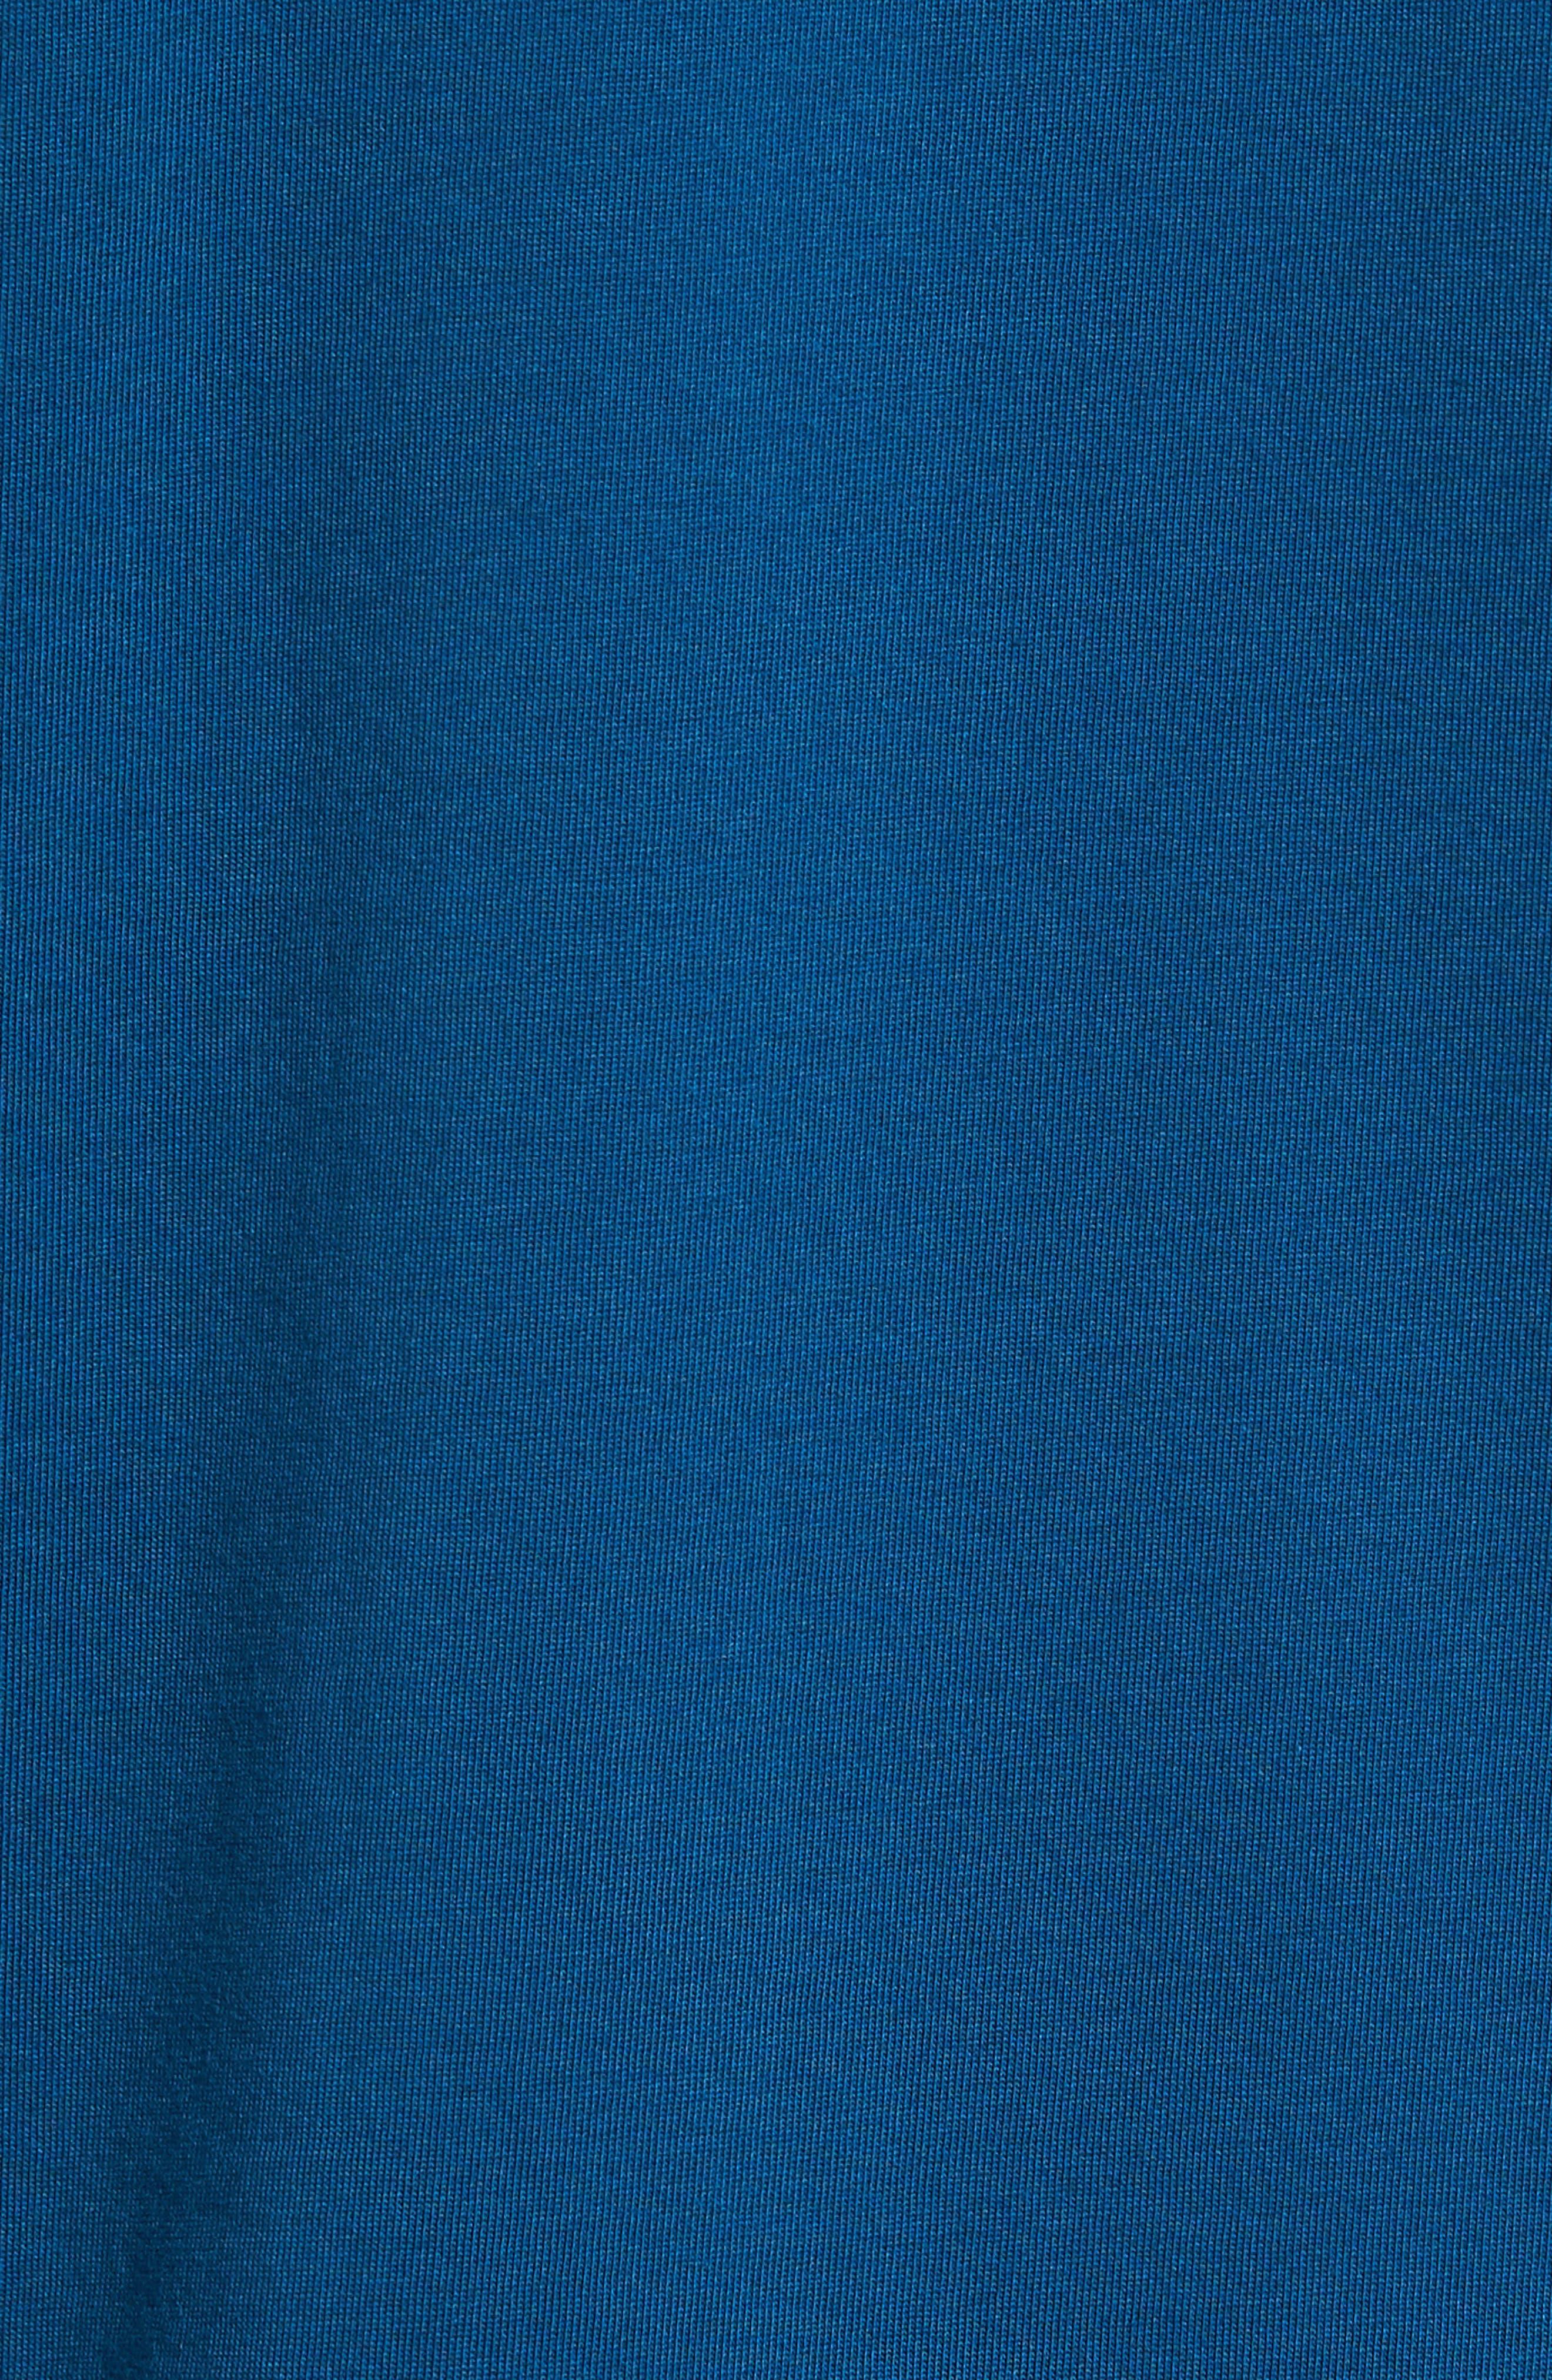 Alternate Image 5  - Tommy Bahama 'Bali Skyline' Long Sleeve Pima Cotton T-Shirt (Big & Tall)